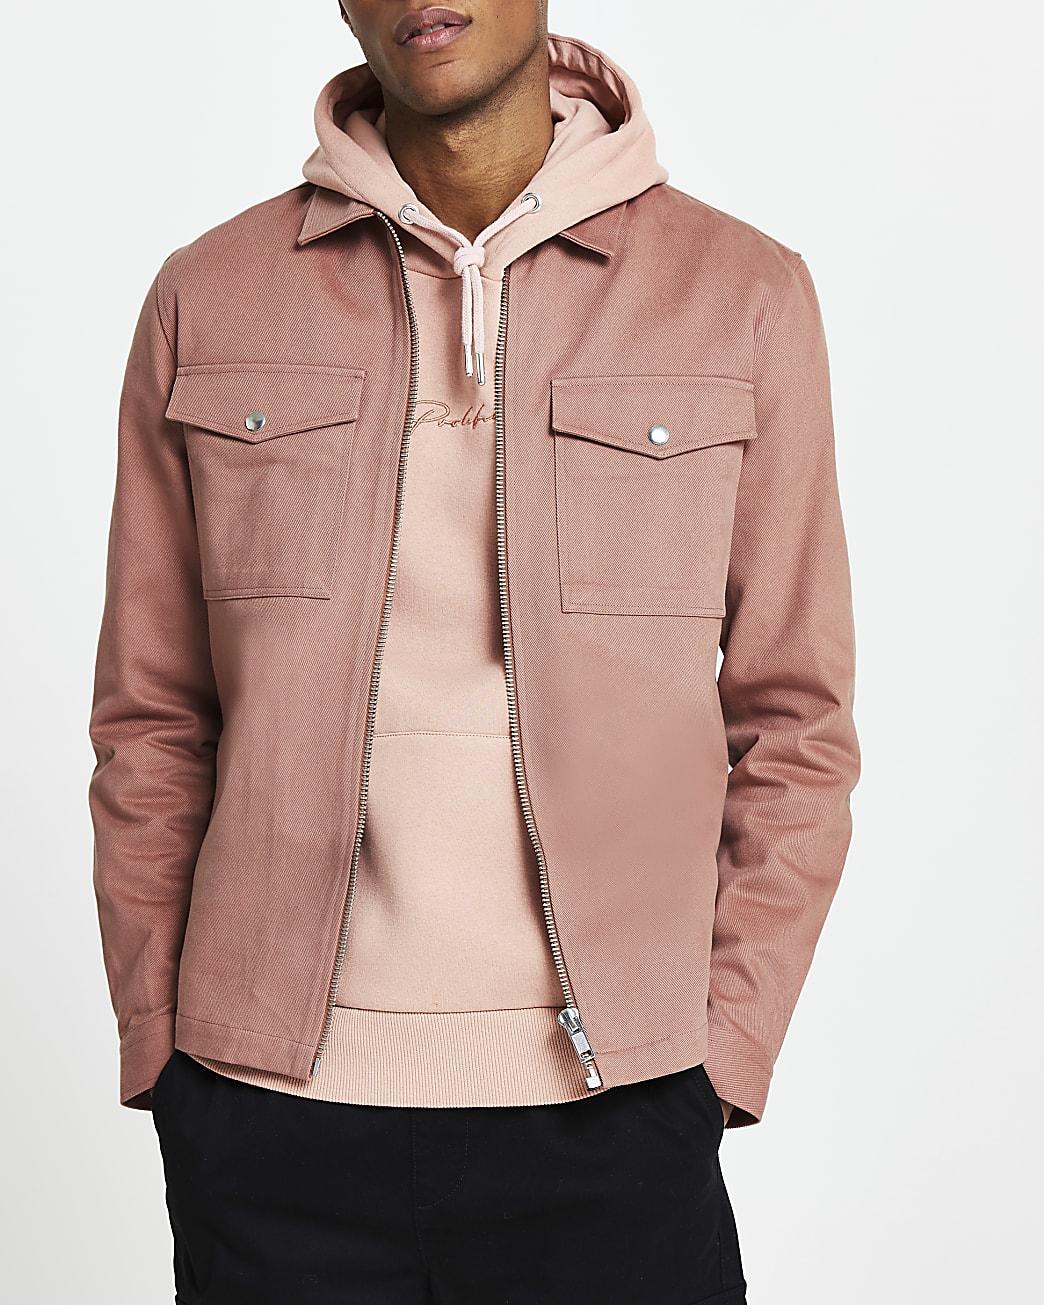 Pink long sleeve shacket